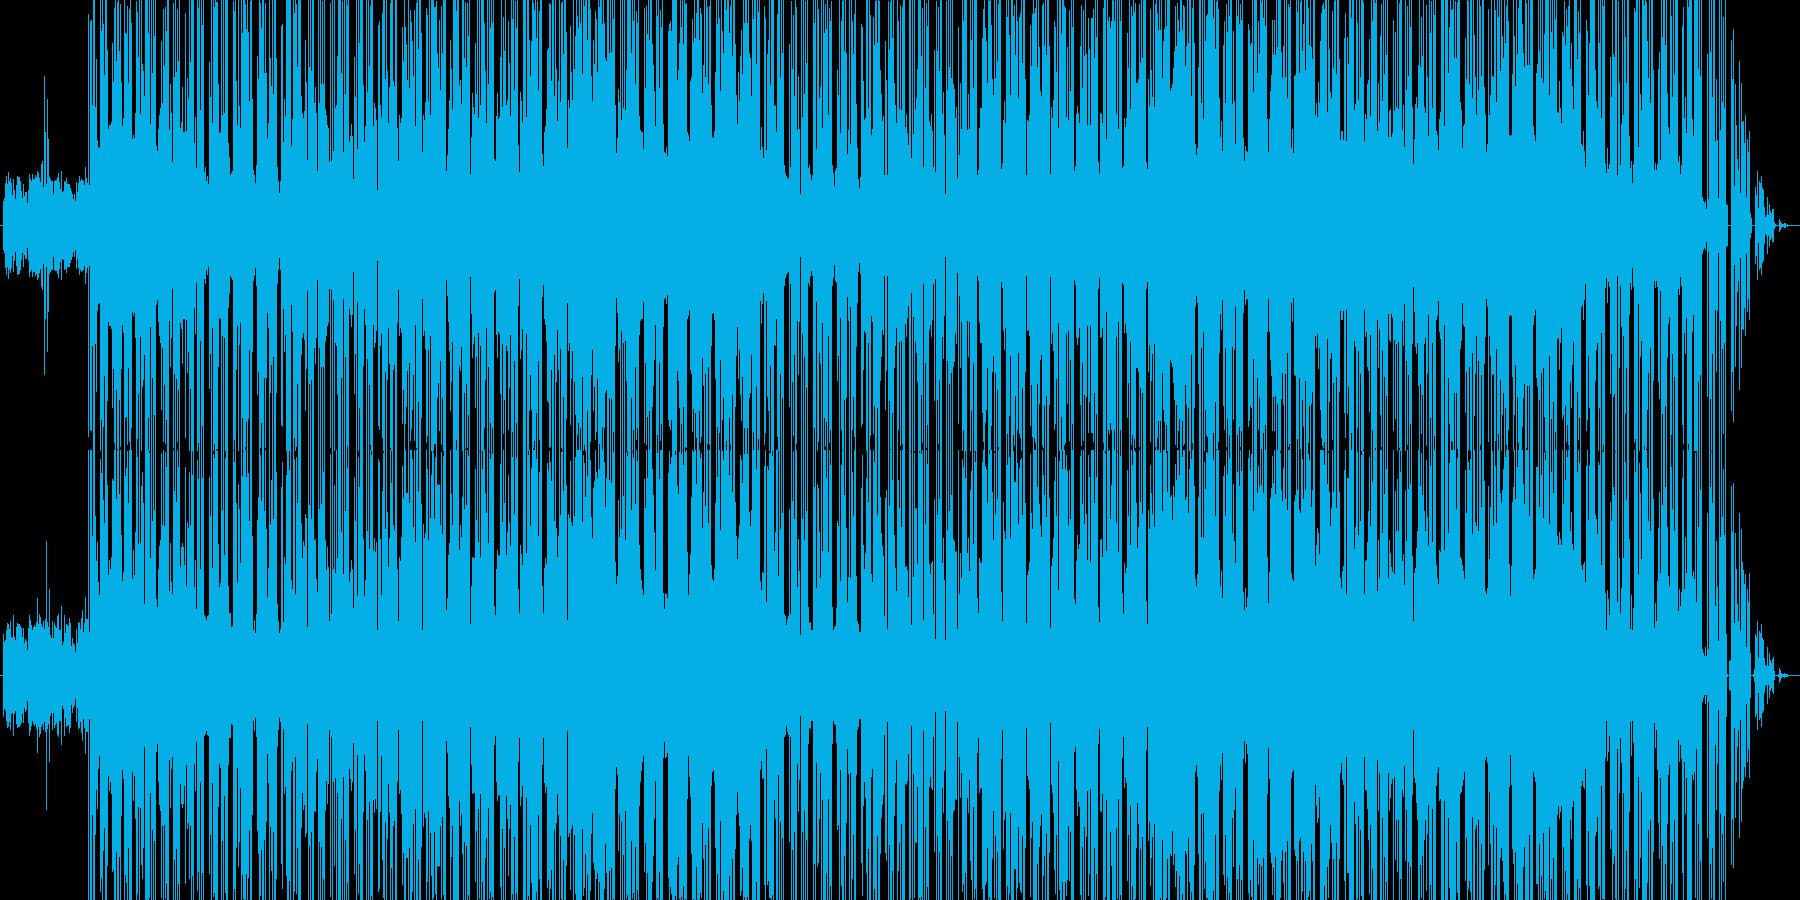 1111 EX sht mix2の再生済みの波形